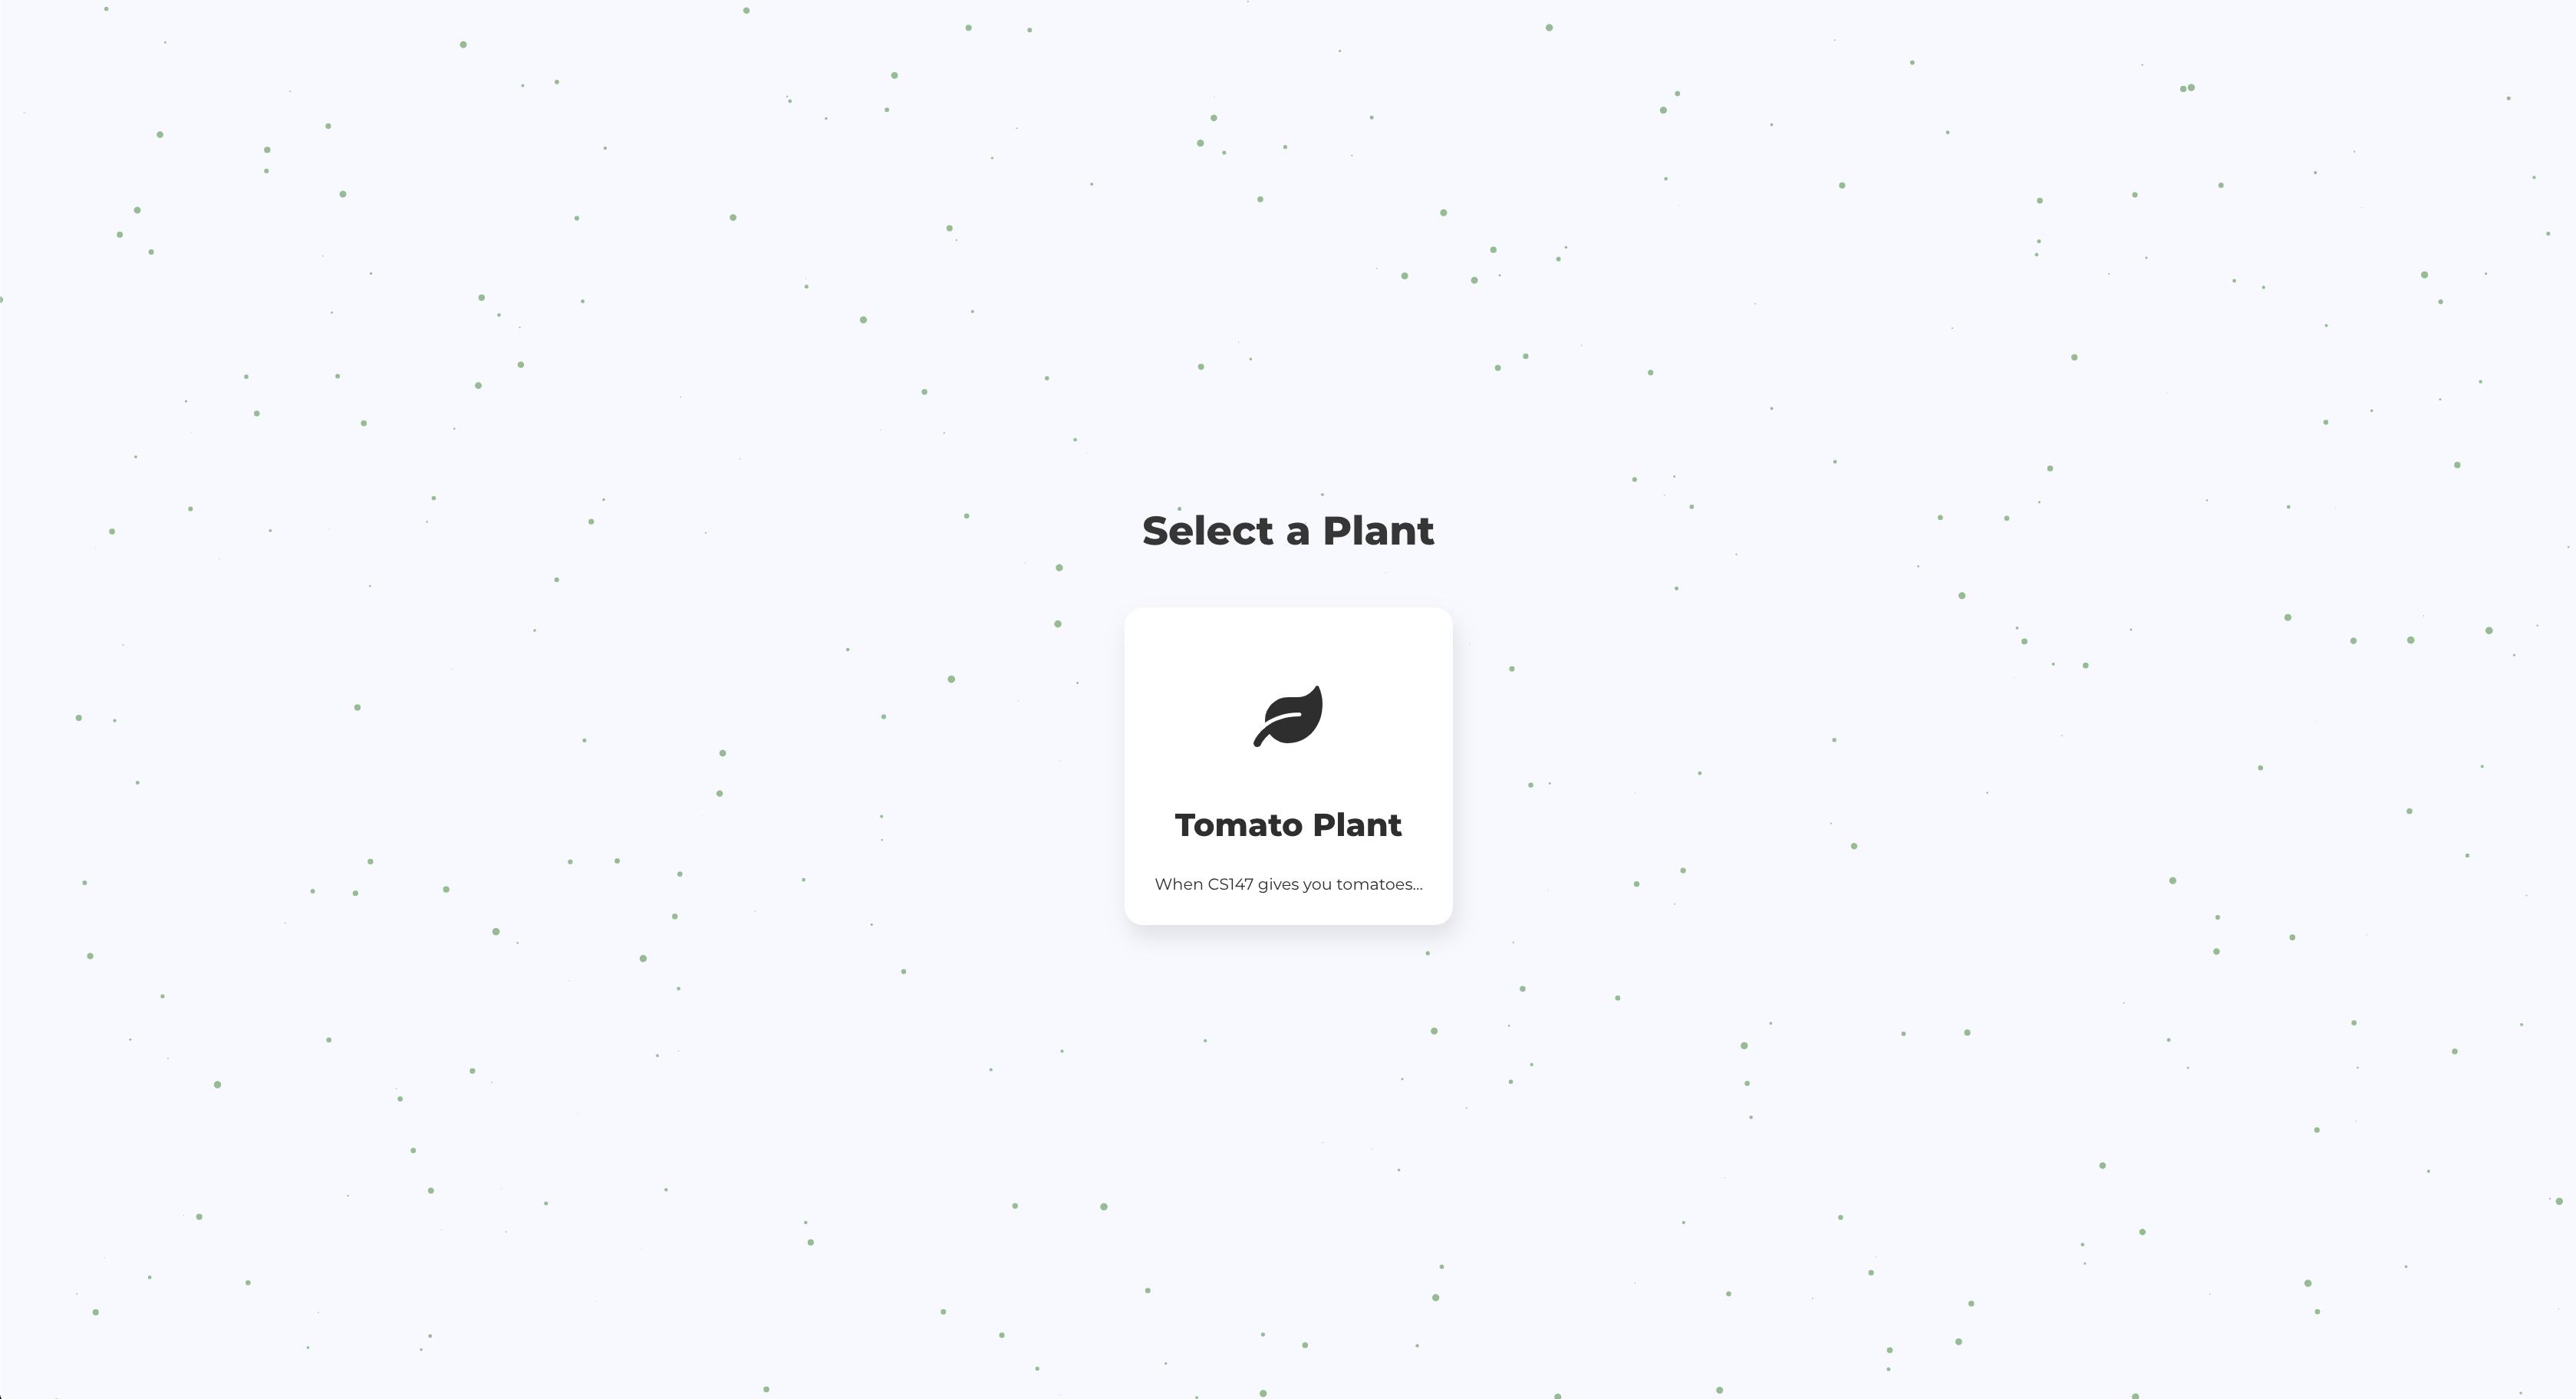 SelectPlant